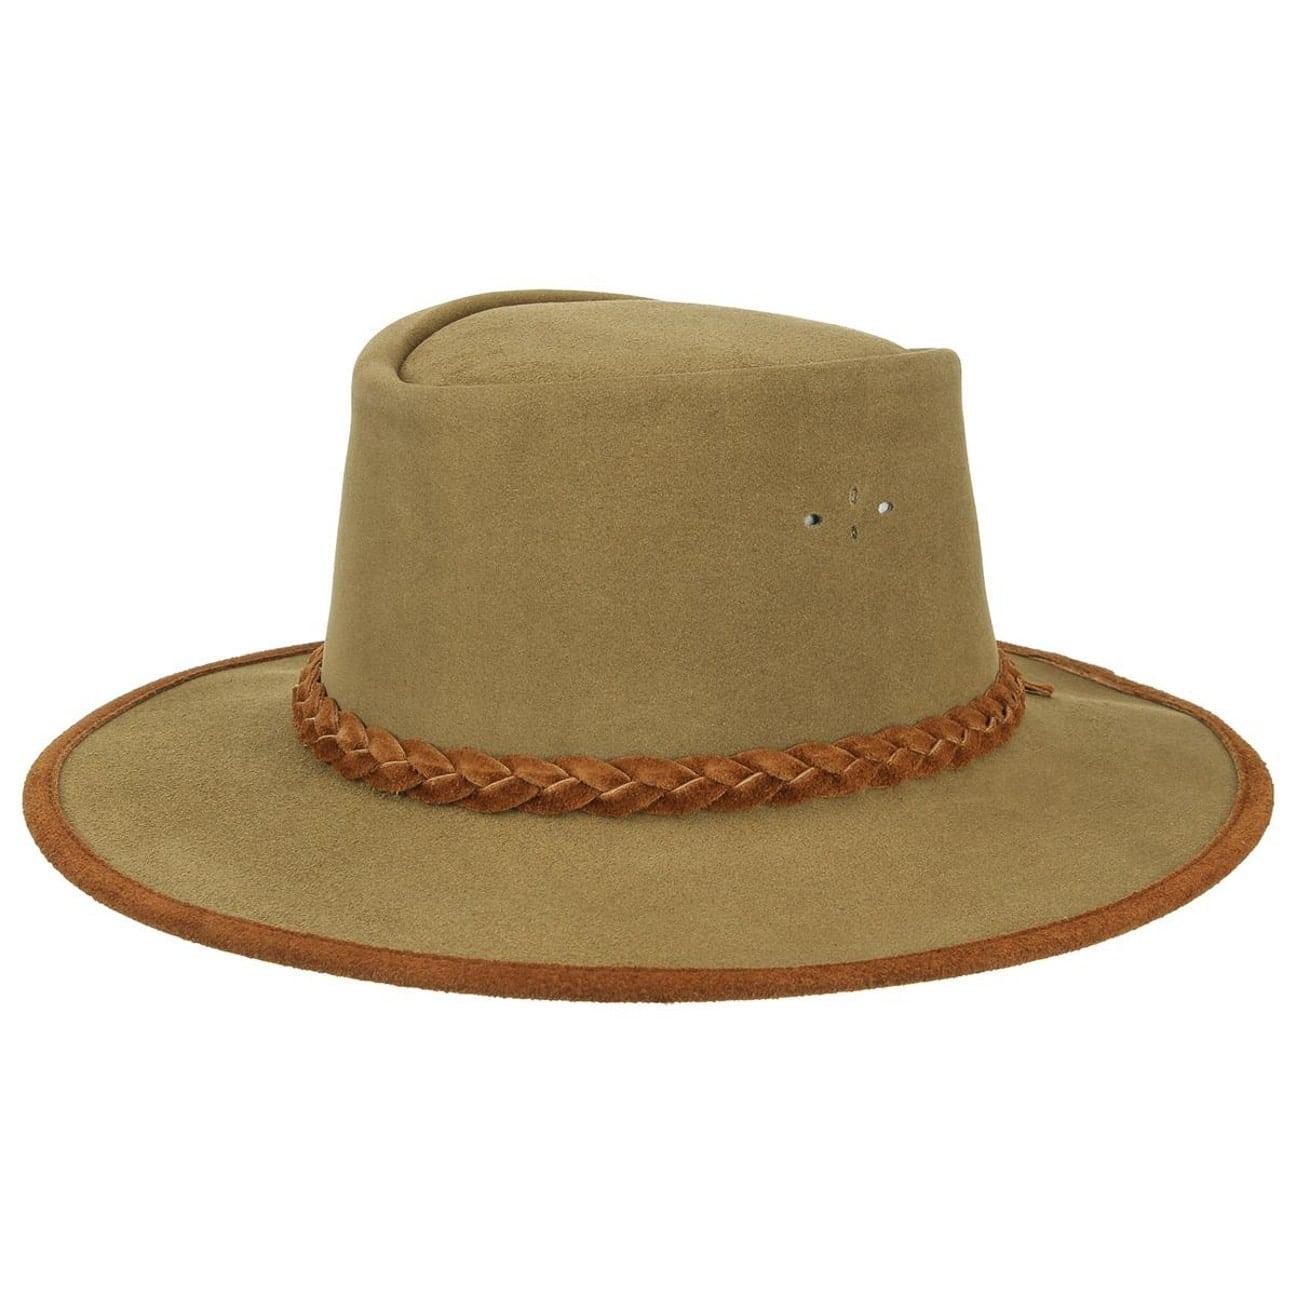 68a57e4fd0b6d Sombrero Australiano Stockman by BC HATS - Sombreros - sombreroshop.es